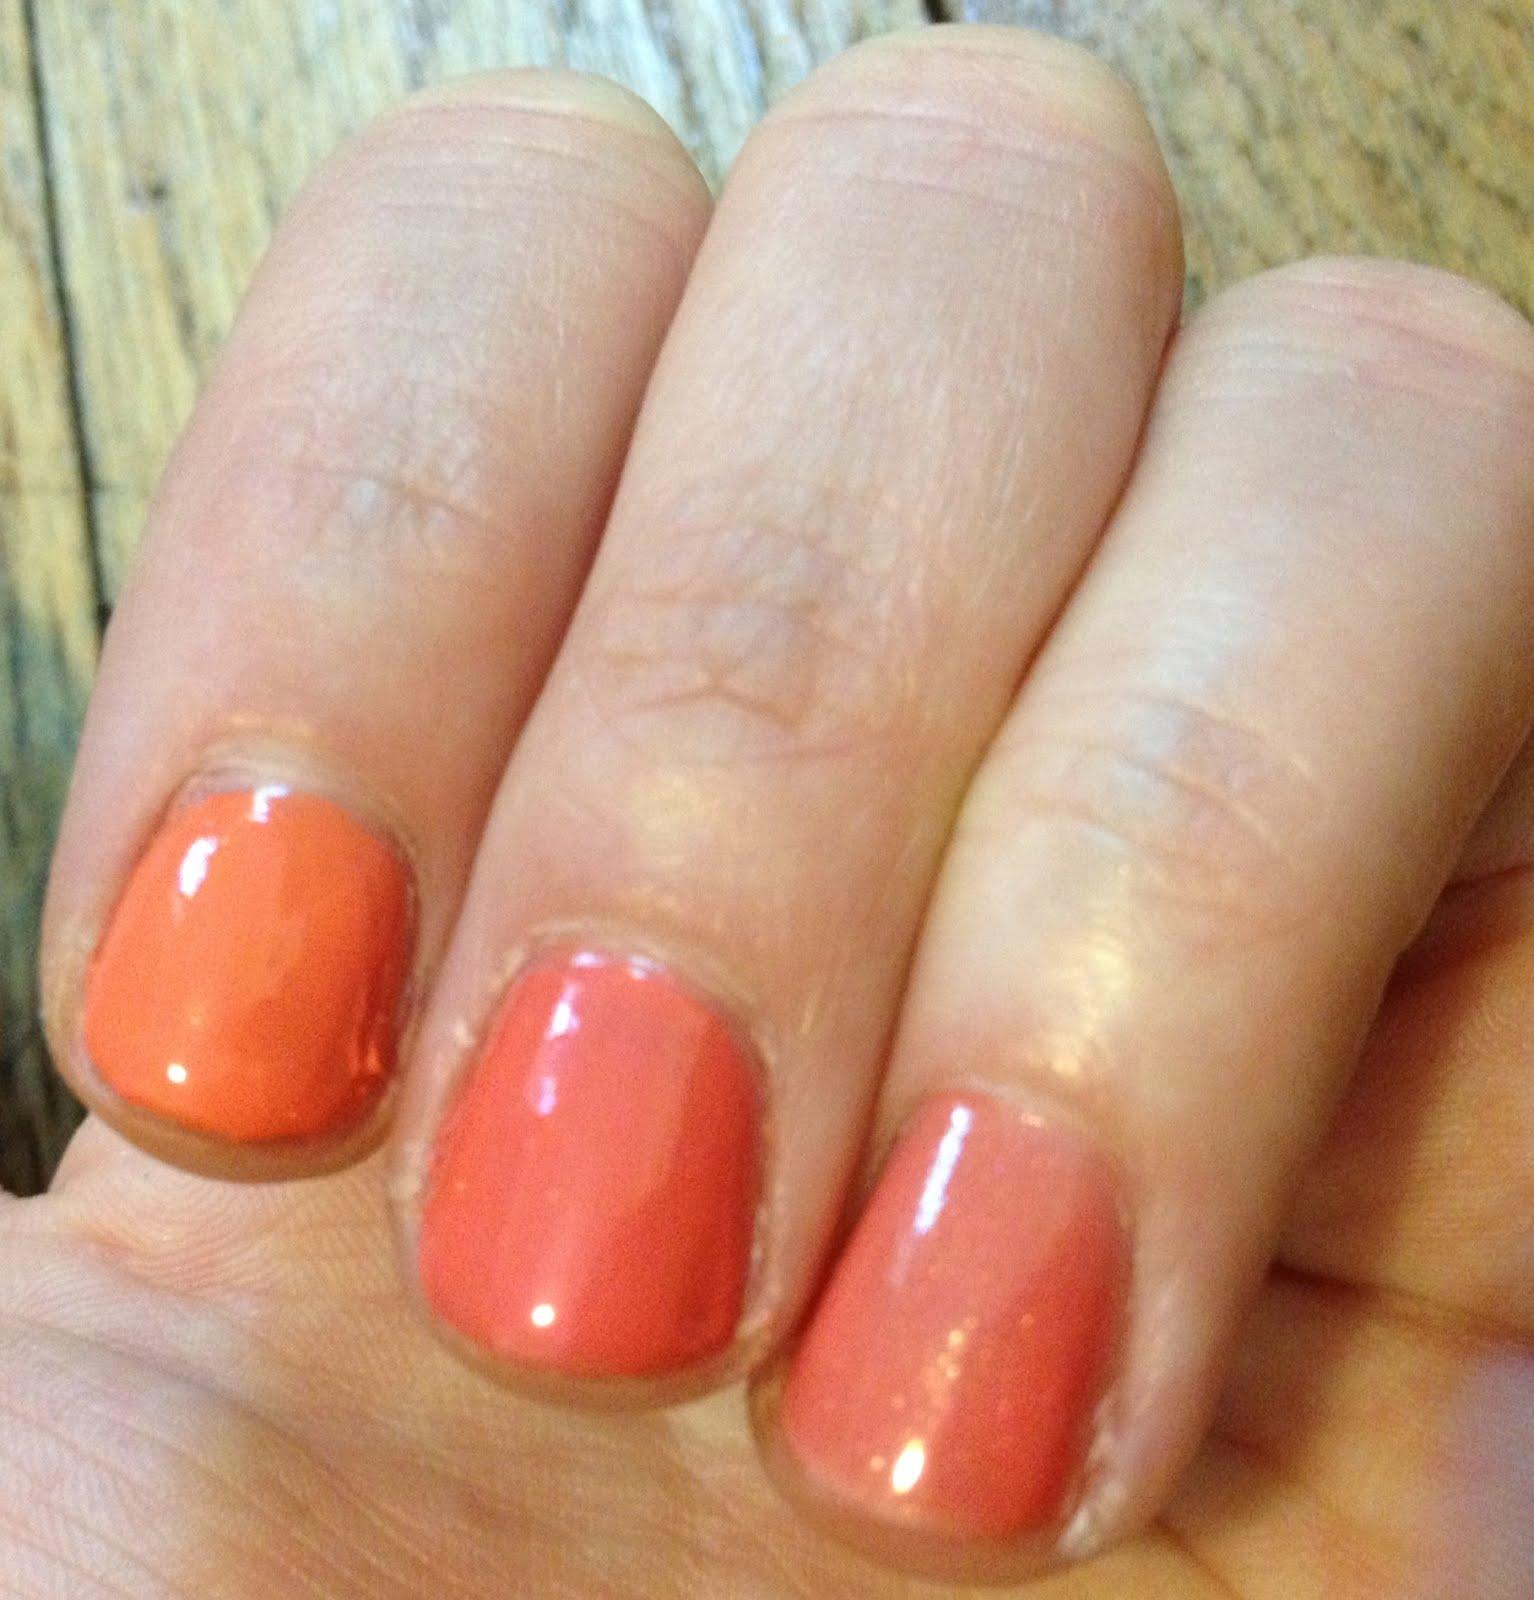 The Beauty of Life: Chanel Orange and Peach Nail Polish Comparison ...